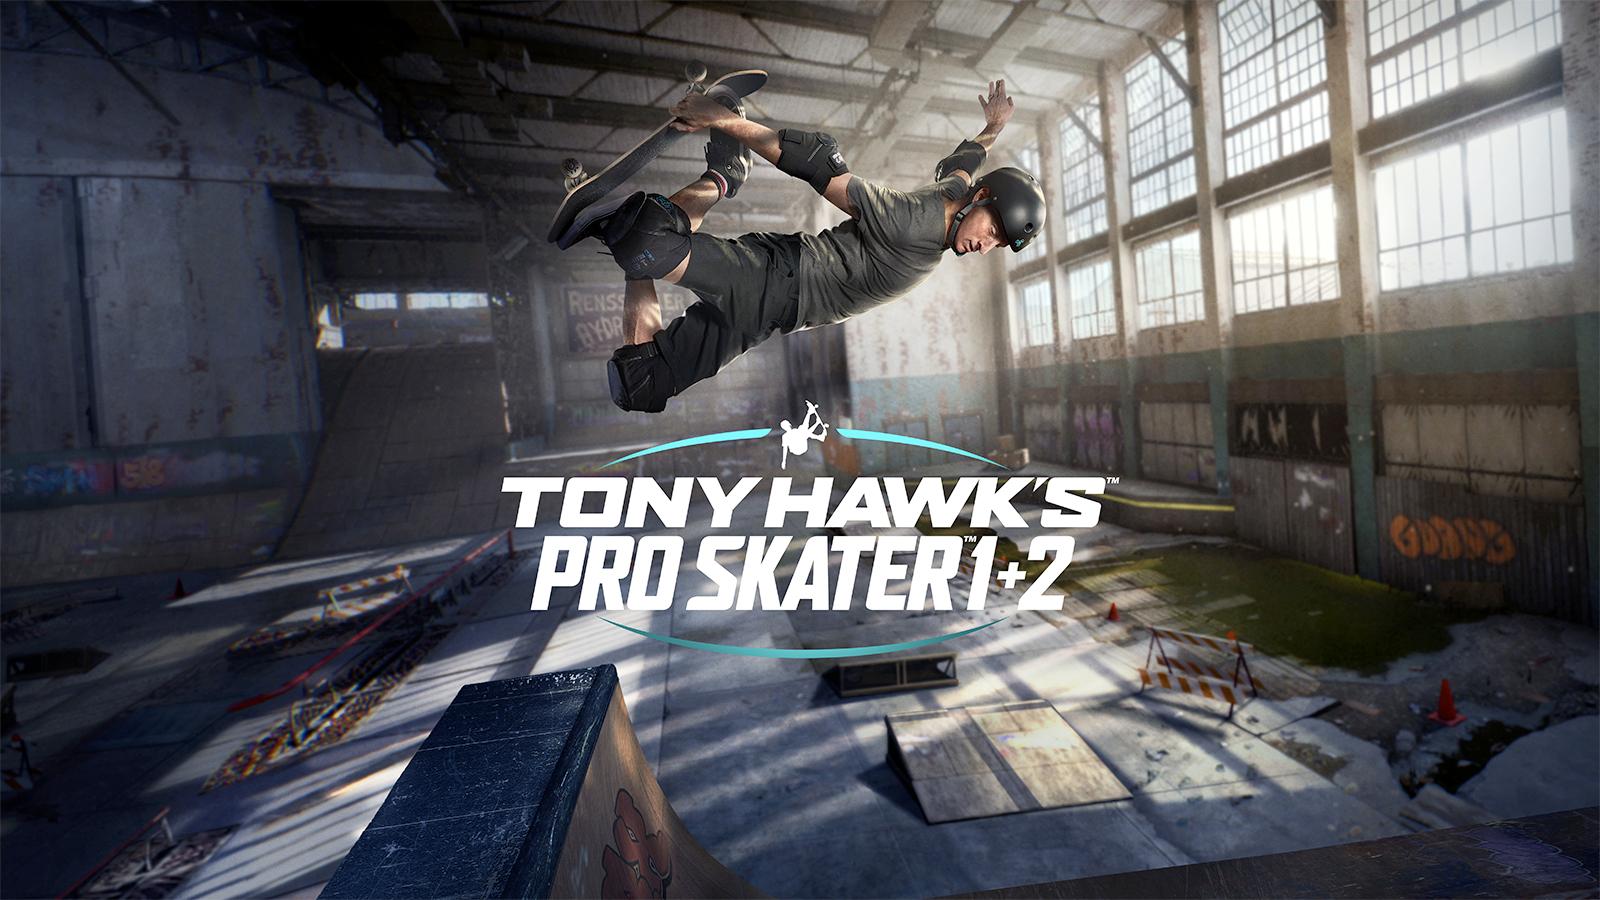 Tony Hawk Pro Skater 1+2 Demo